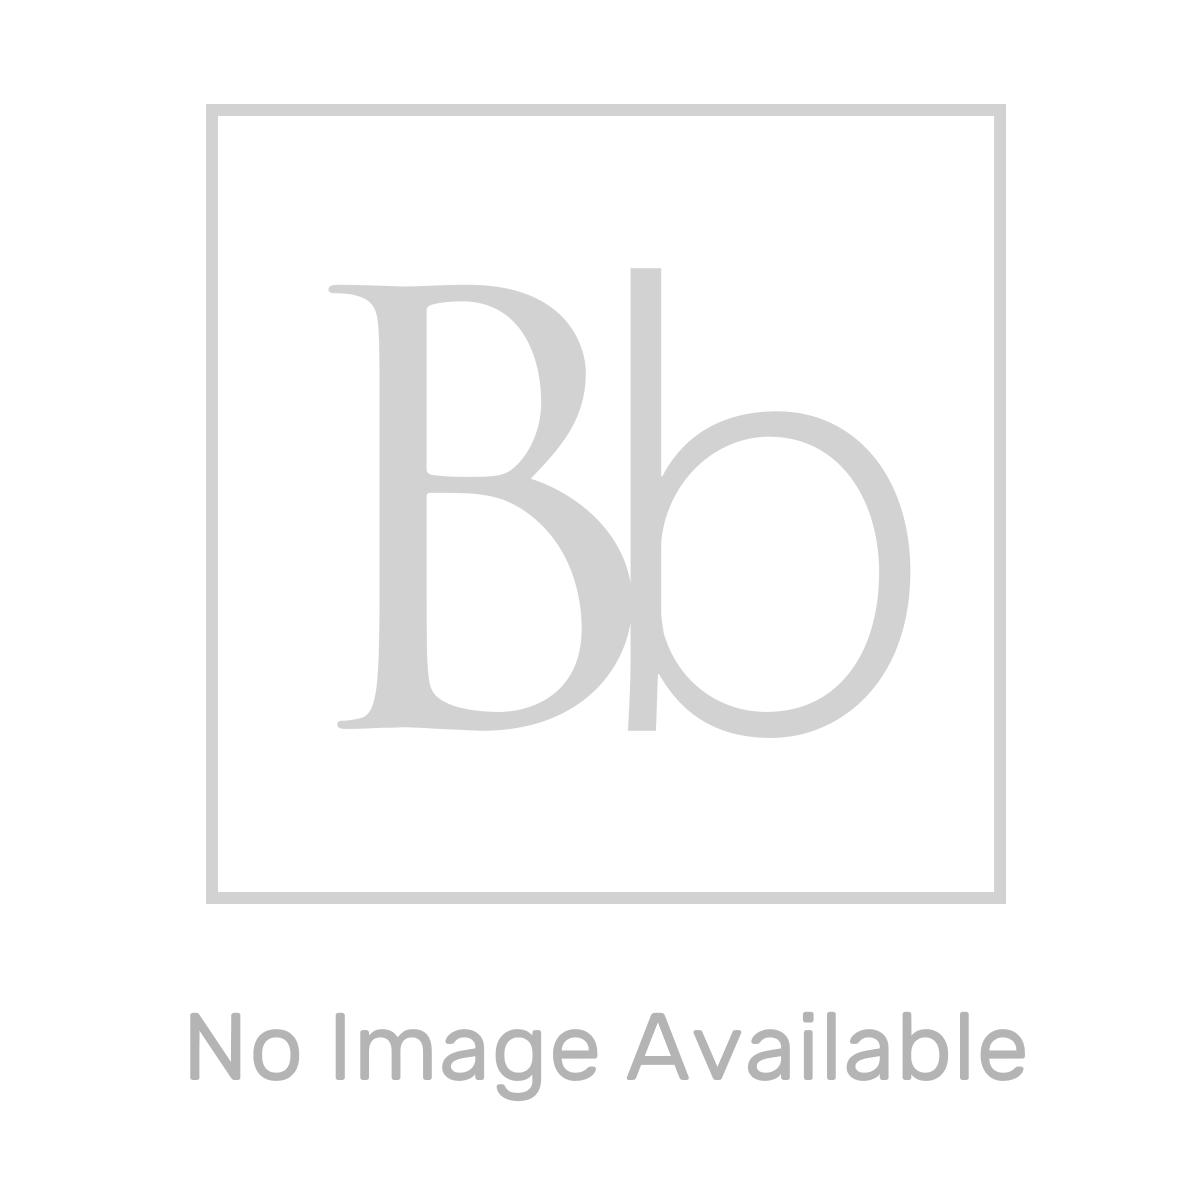 RAK Surface Matt Sand Tile 300 x 600mm Lifestyle